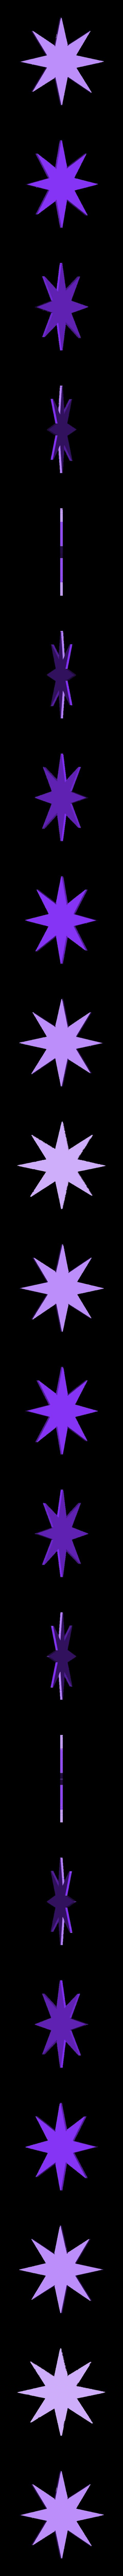 étoile8 2.stl Download STL file the christmas star • 3D printer model, catf3d